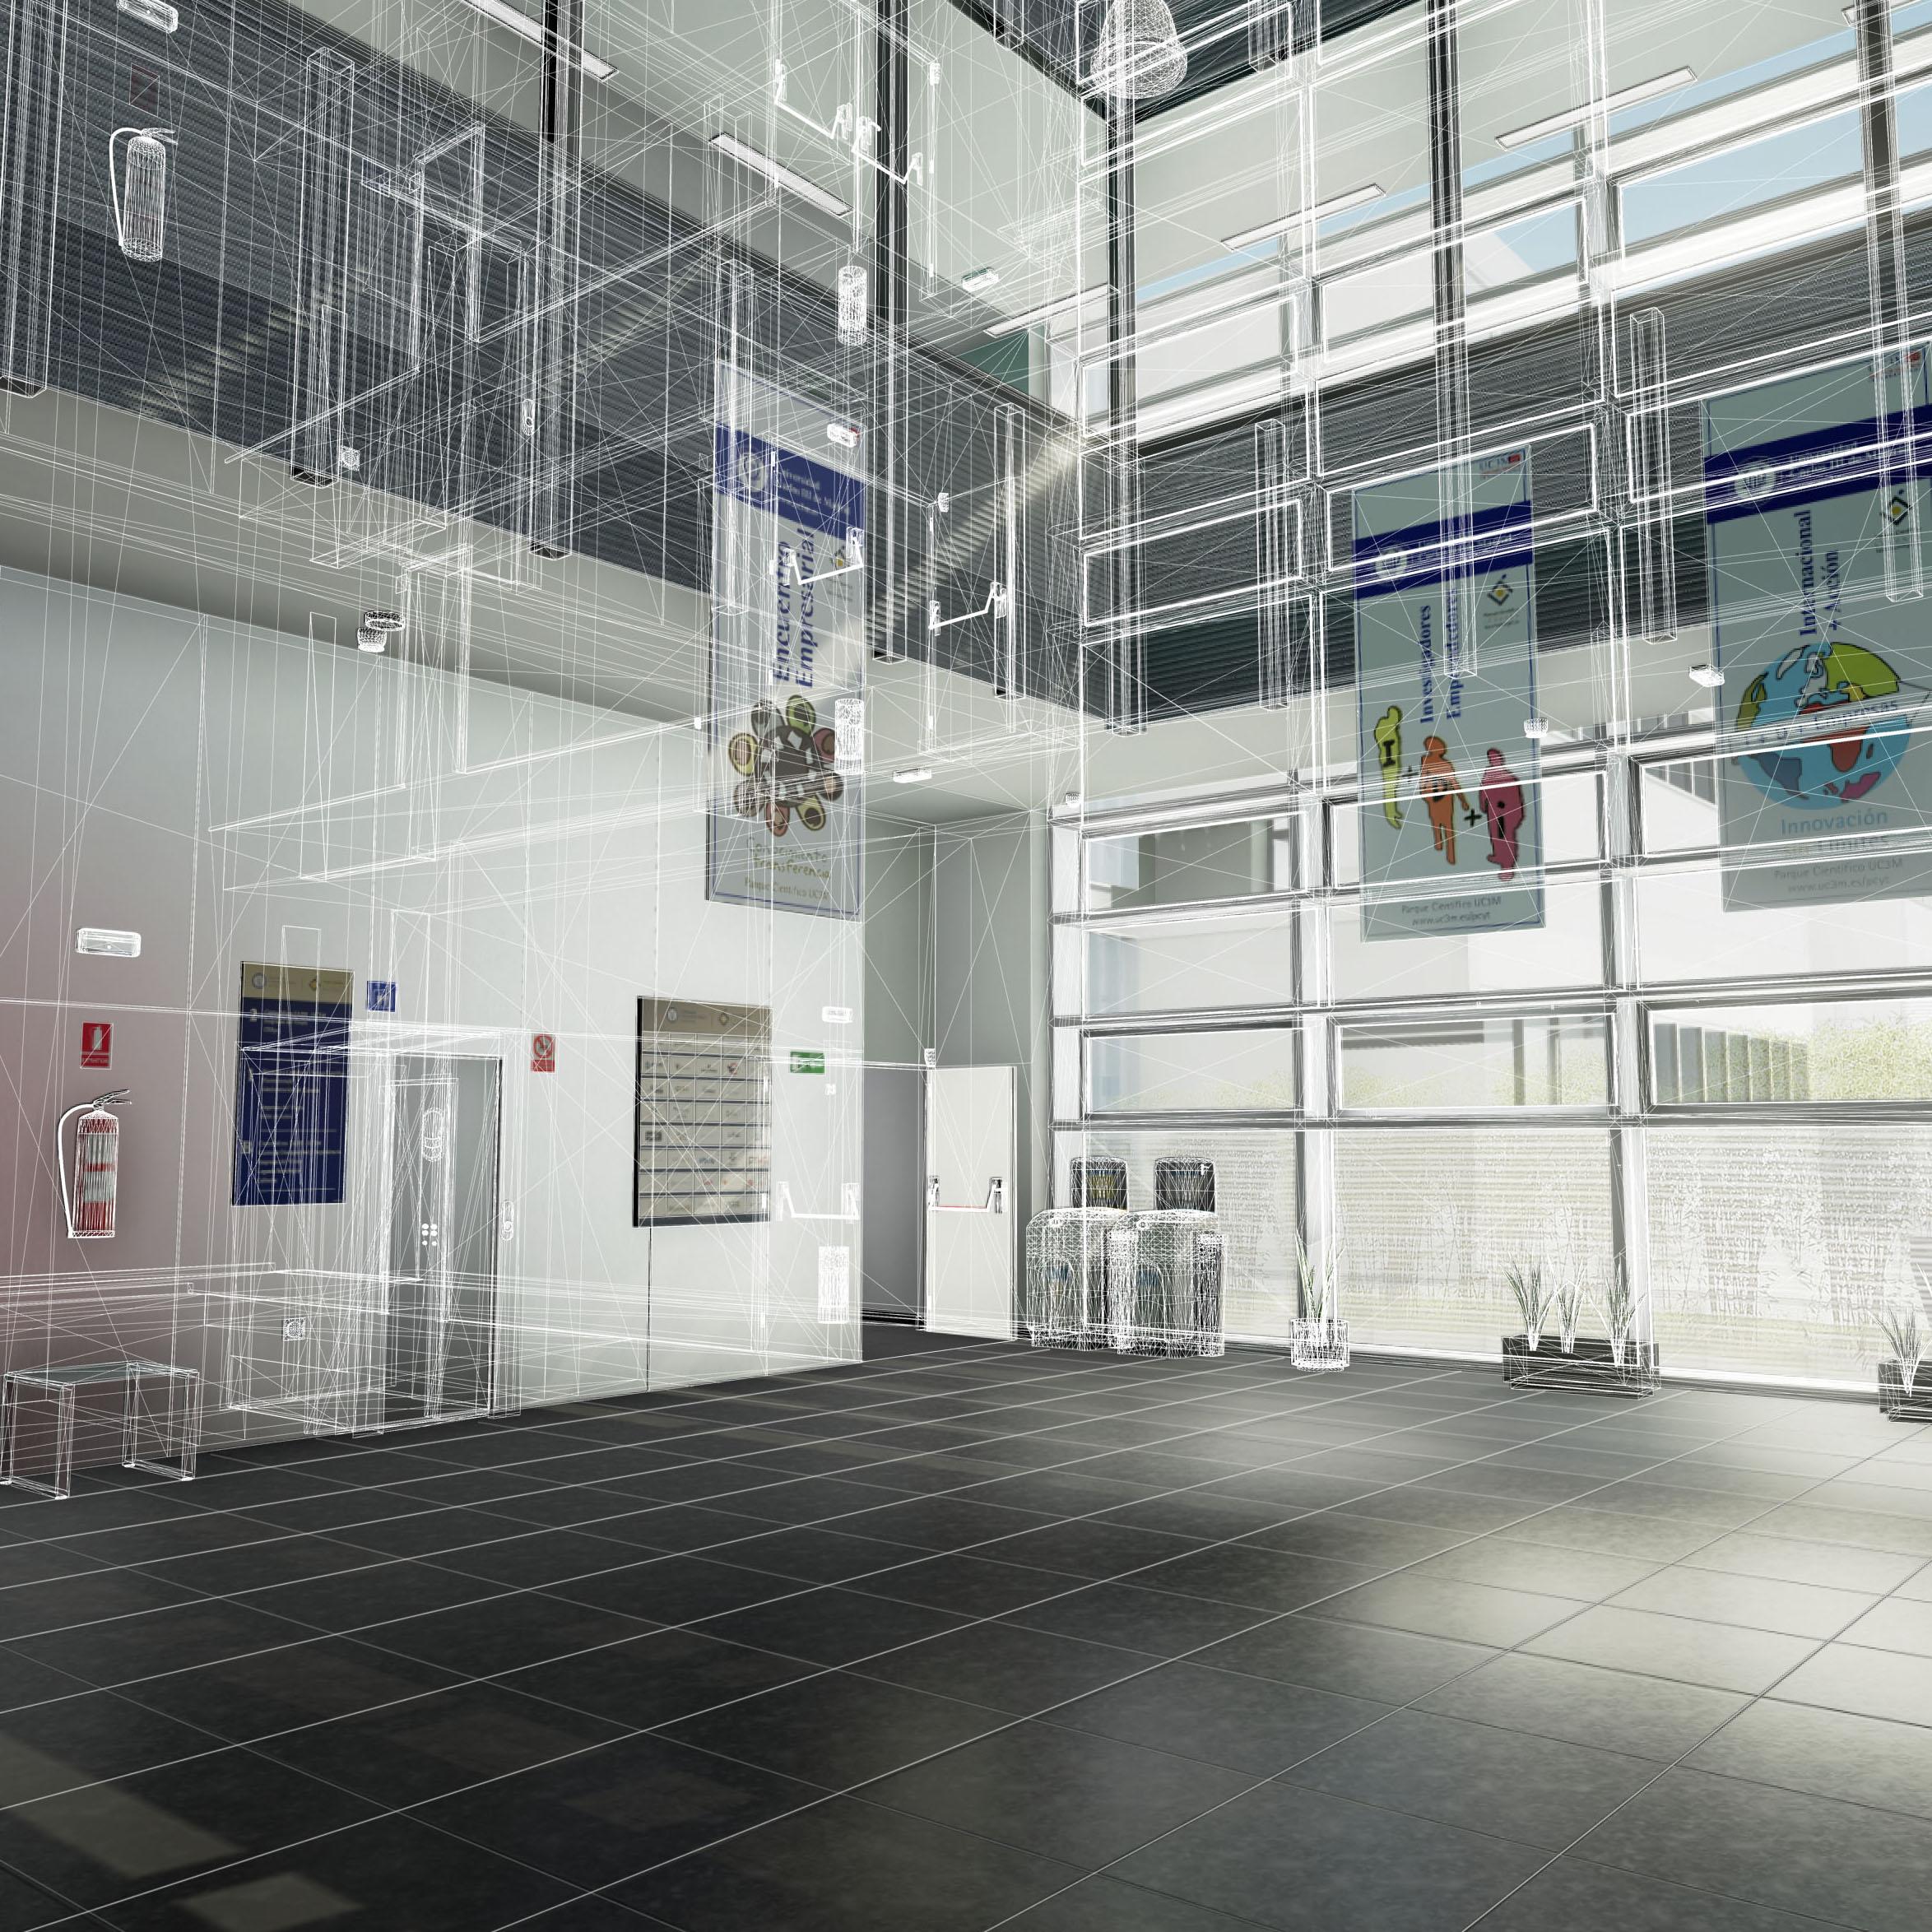 Studio Lighting Ue4: UE4 BIM ARCHITECTURE